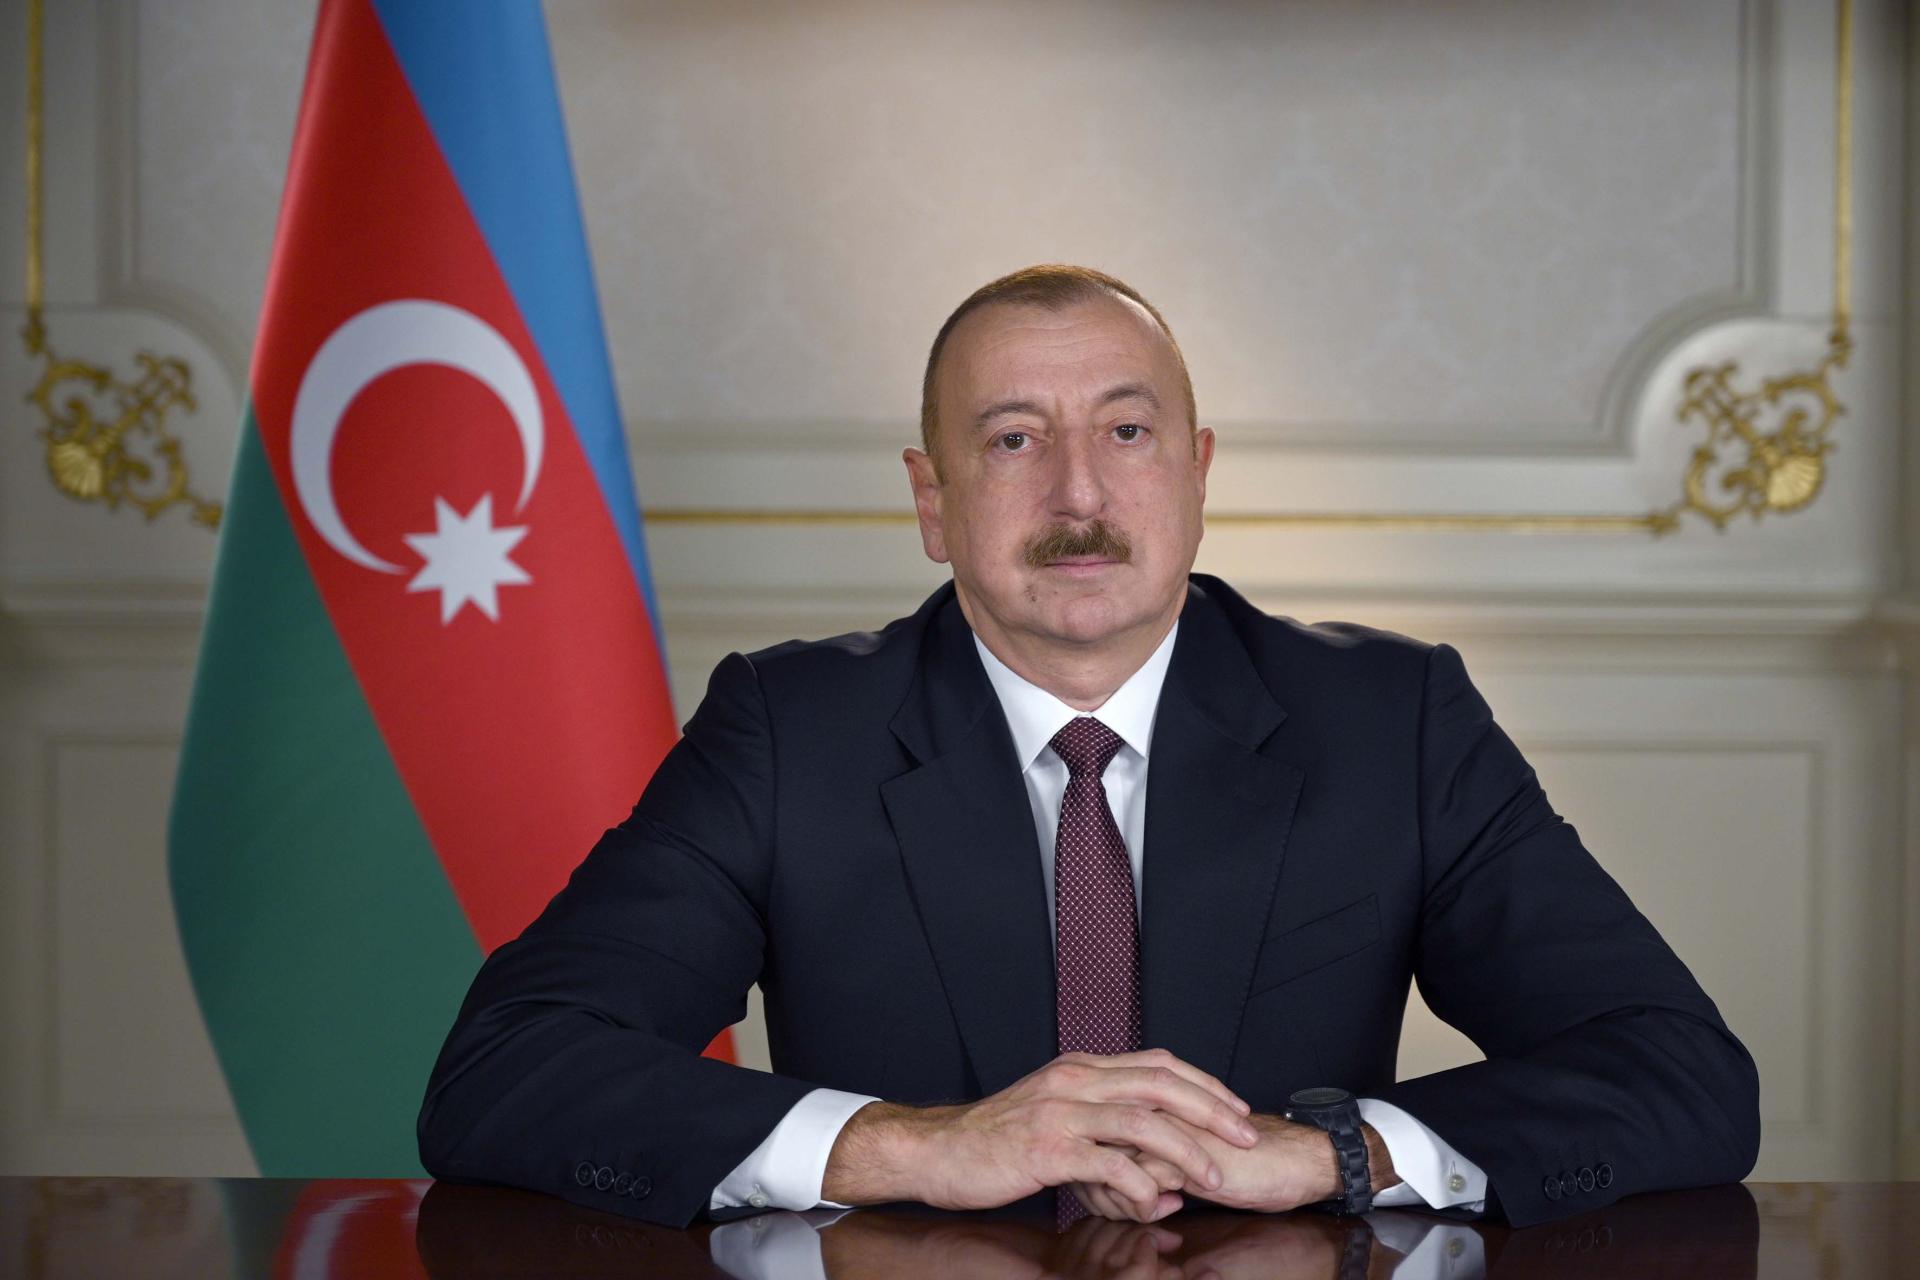 2020/10/ilham_aliyev_main_new_president_310120_1_1603923849.jpg